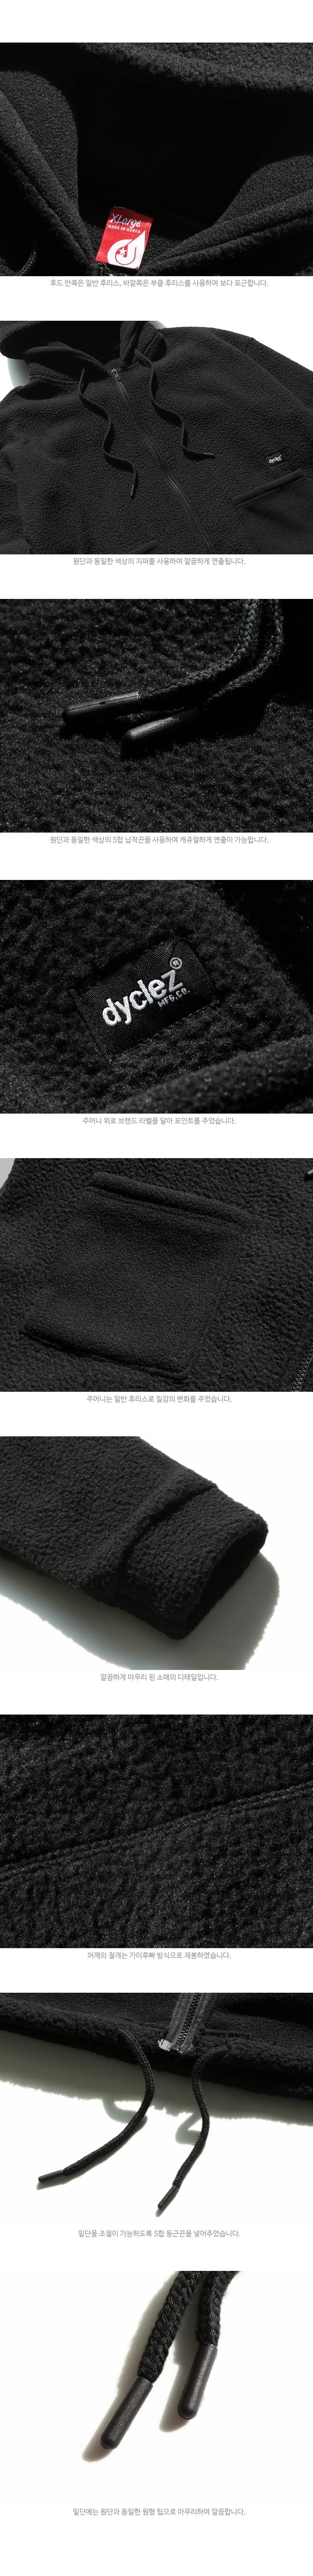 LHHD5113_detail_black_02.jpg